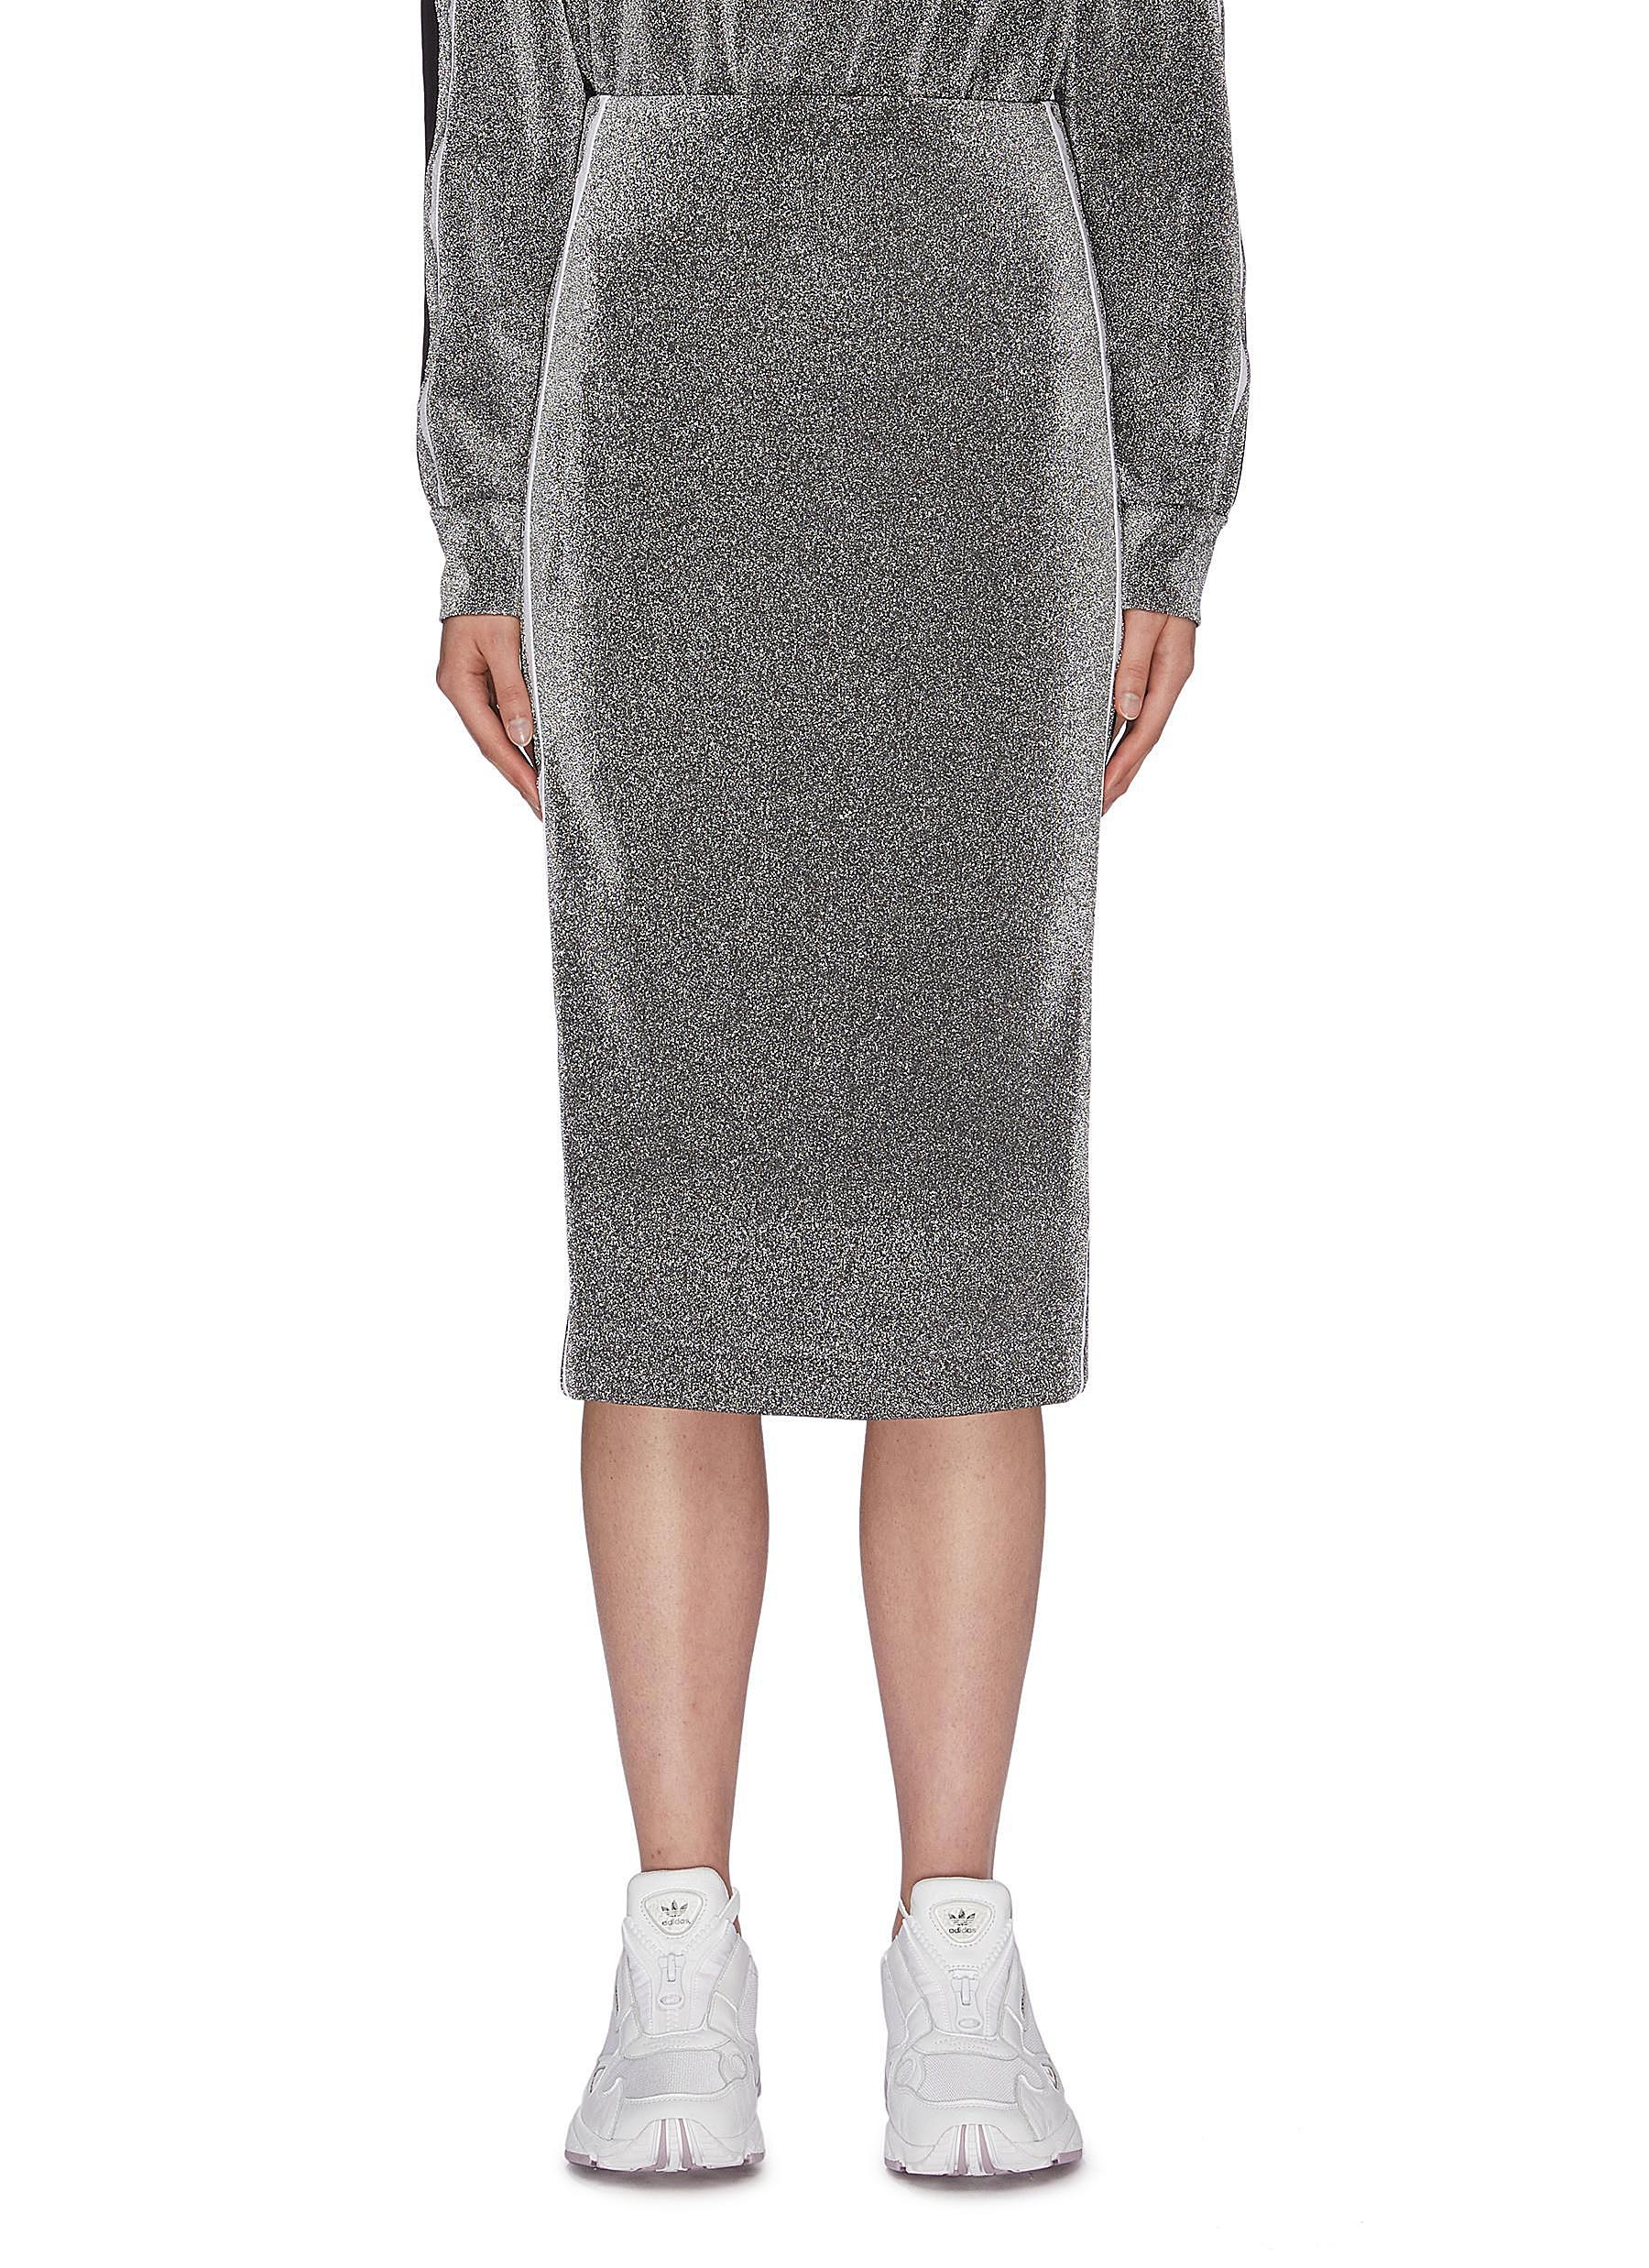 Brazen stripe outseam metallic pencil skirt by No Ka'Oi